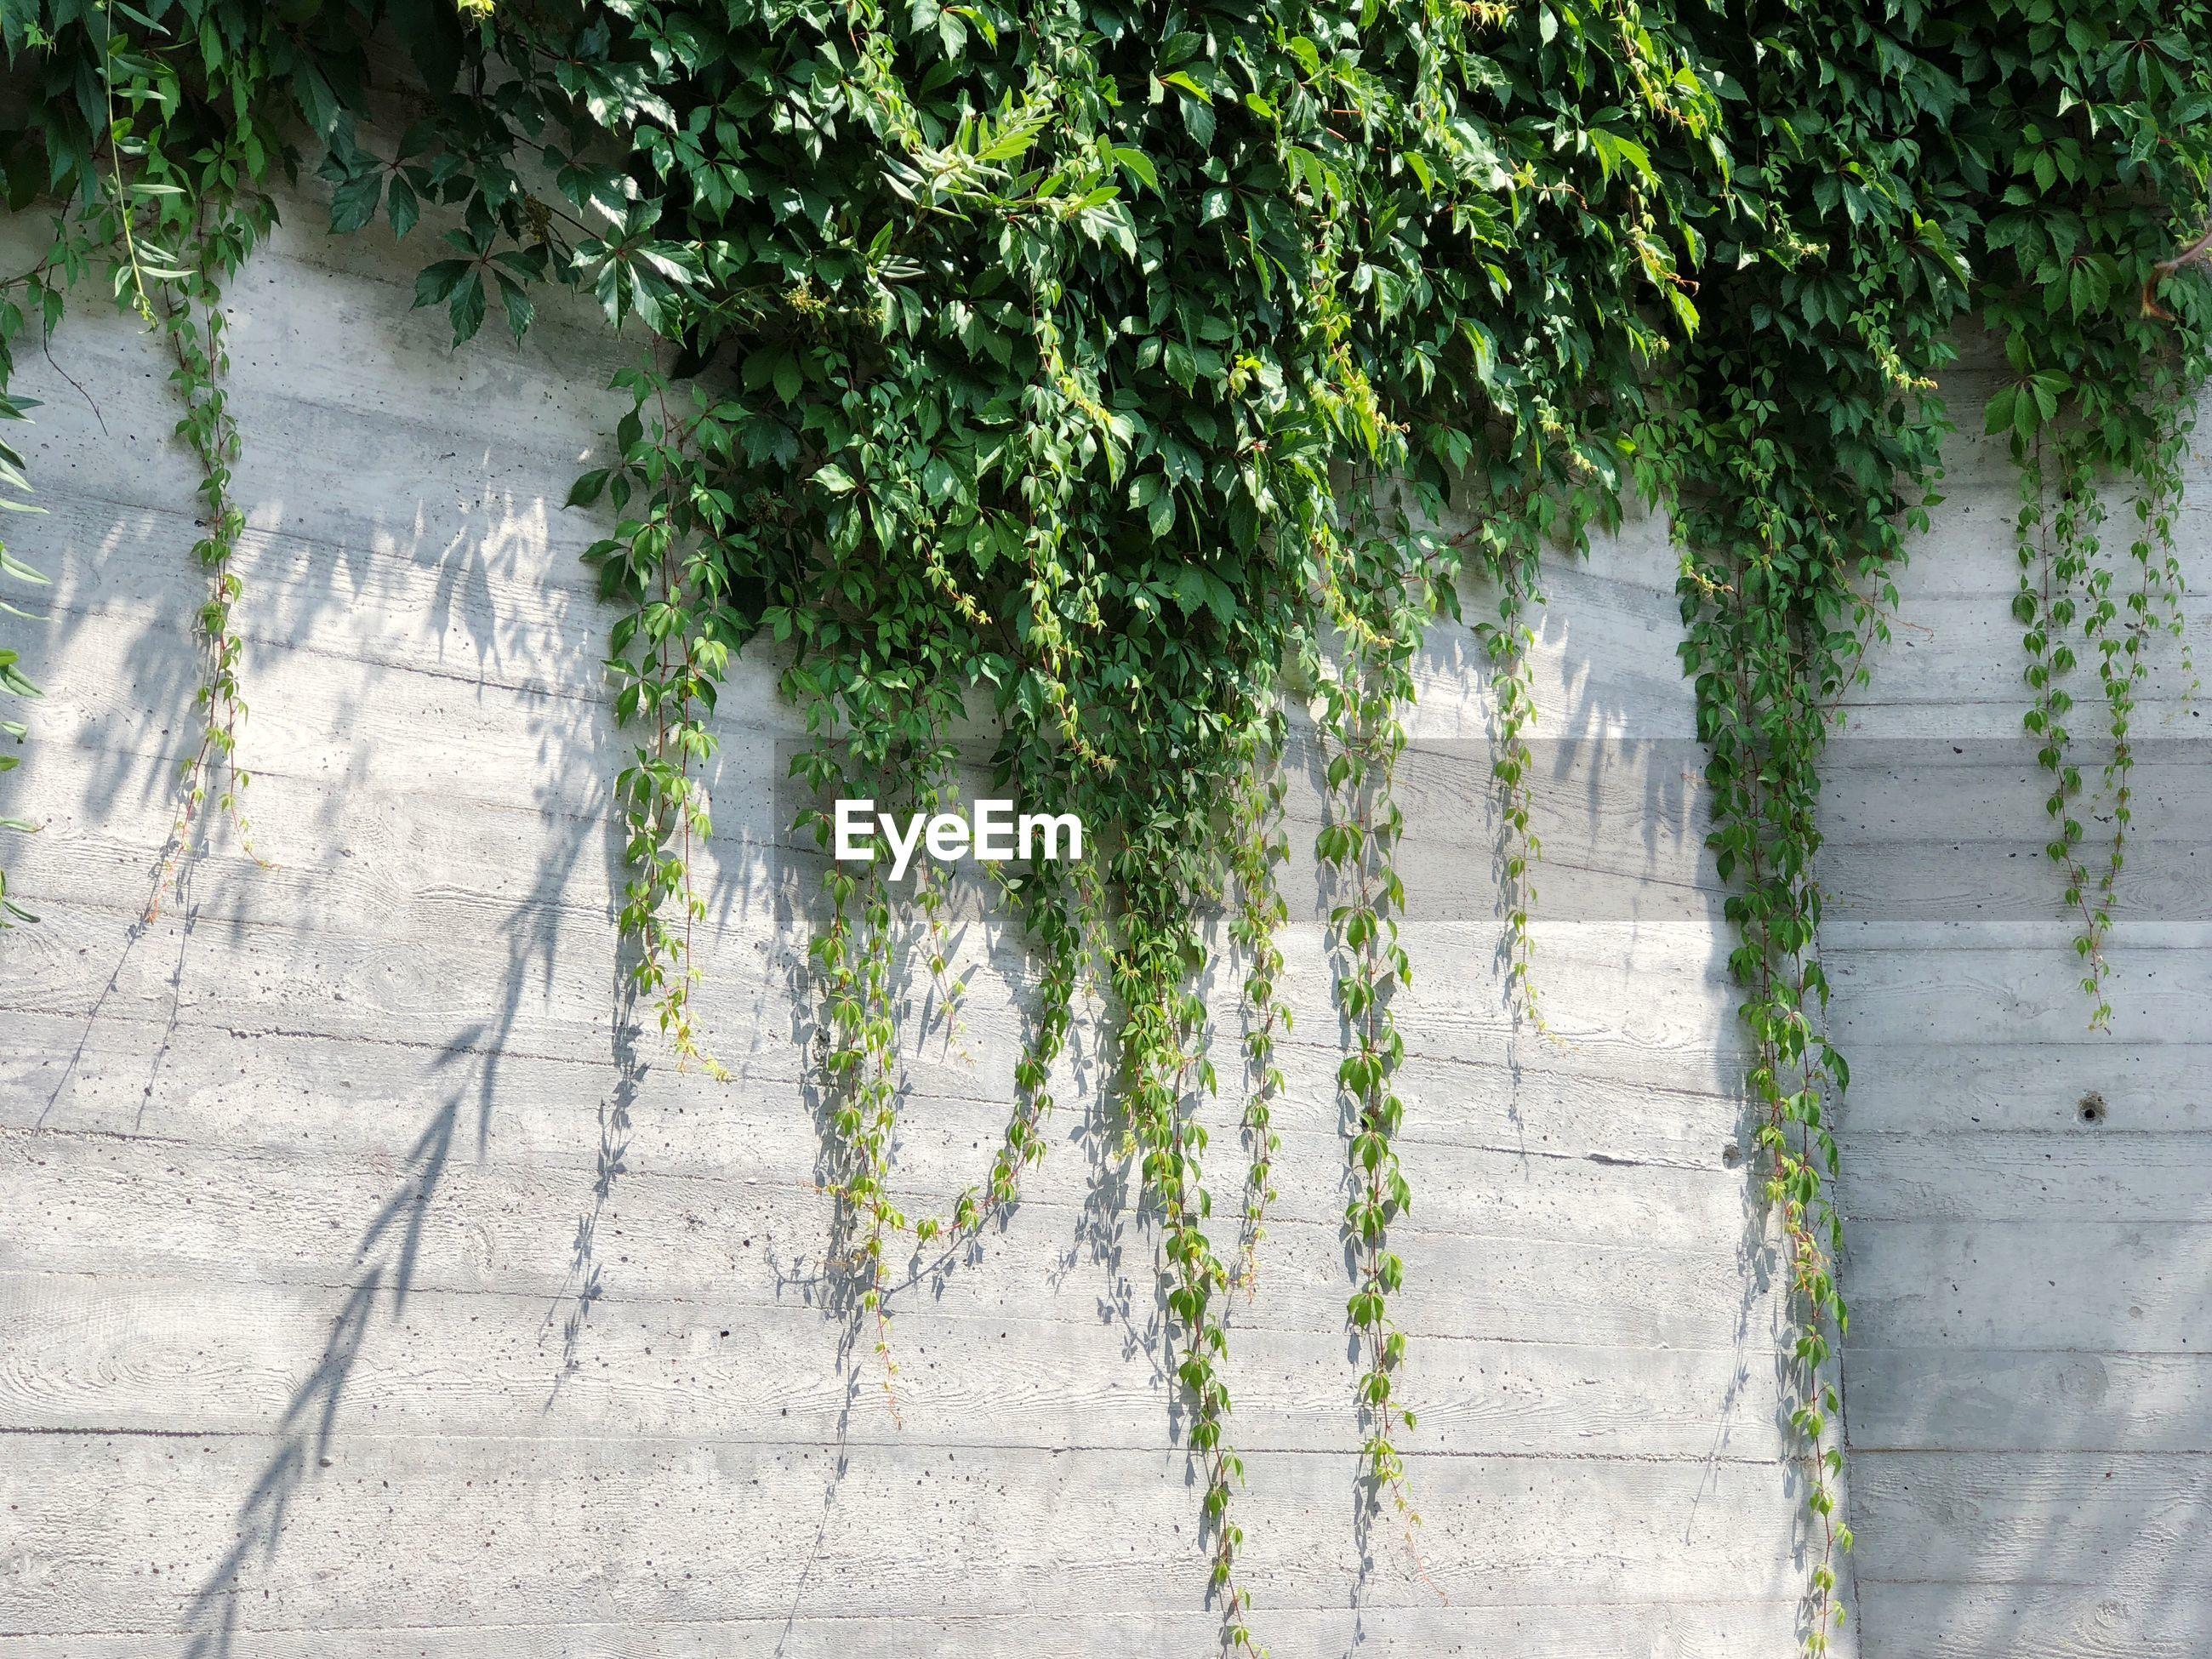 IVY GROWING ON TREE TRUNK FOOTPATH